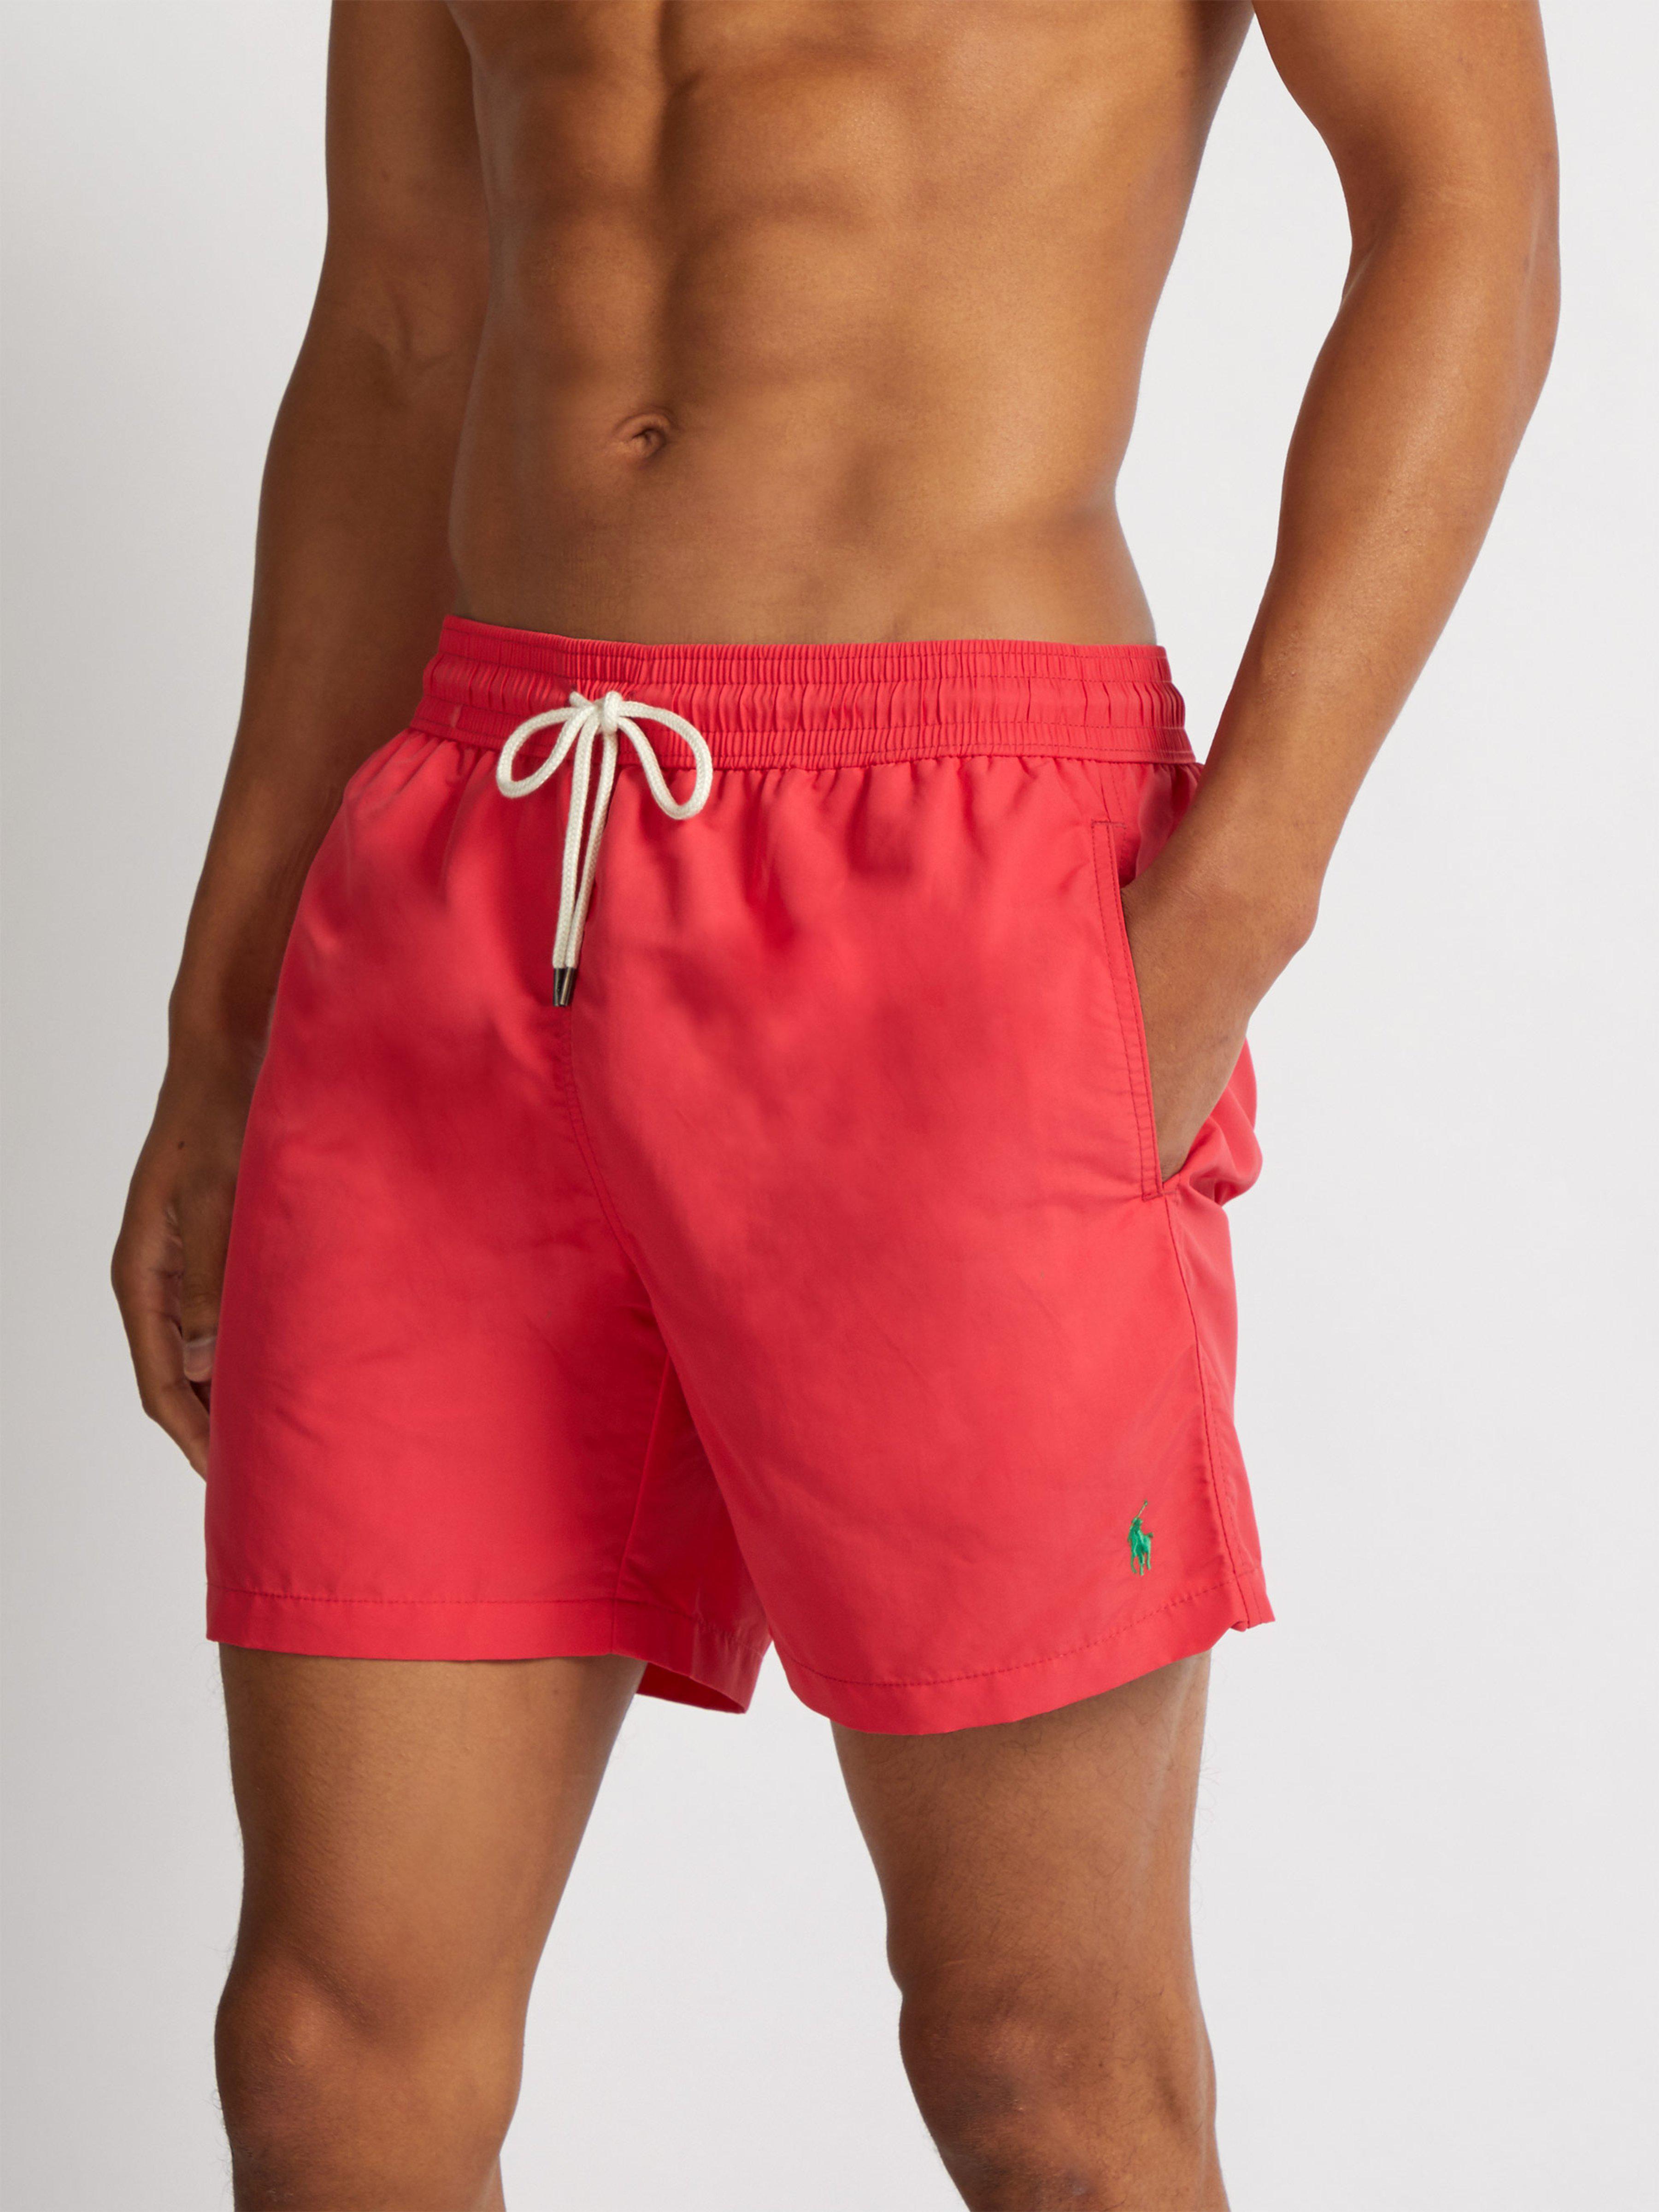 3fa88ad9eb1b3 ... best price polo ralph lauren logo embroidered swim shorts for men lyst.  view fullscreen 220ea